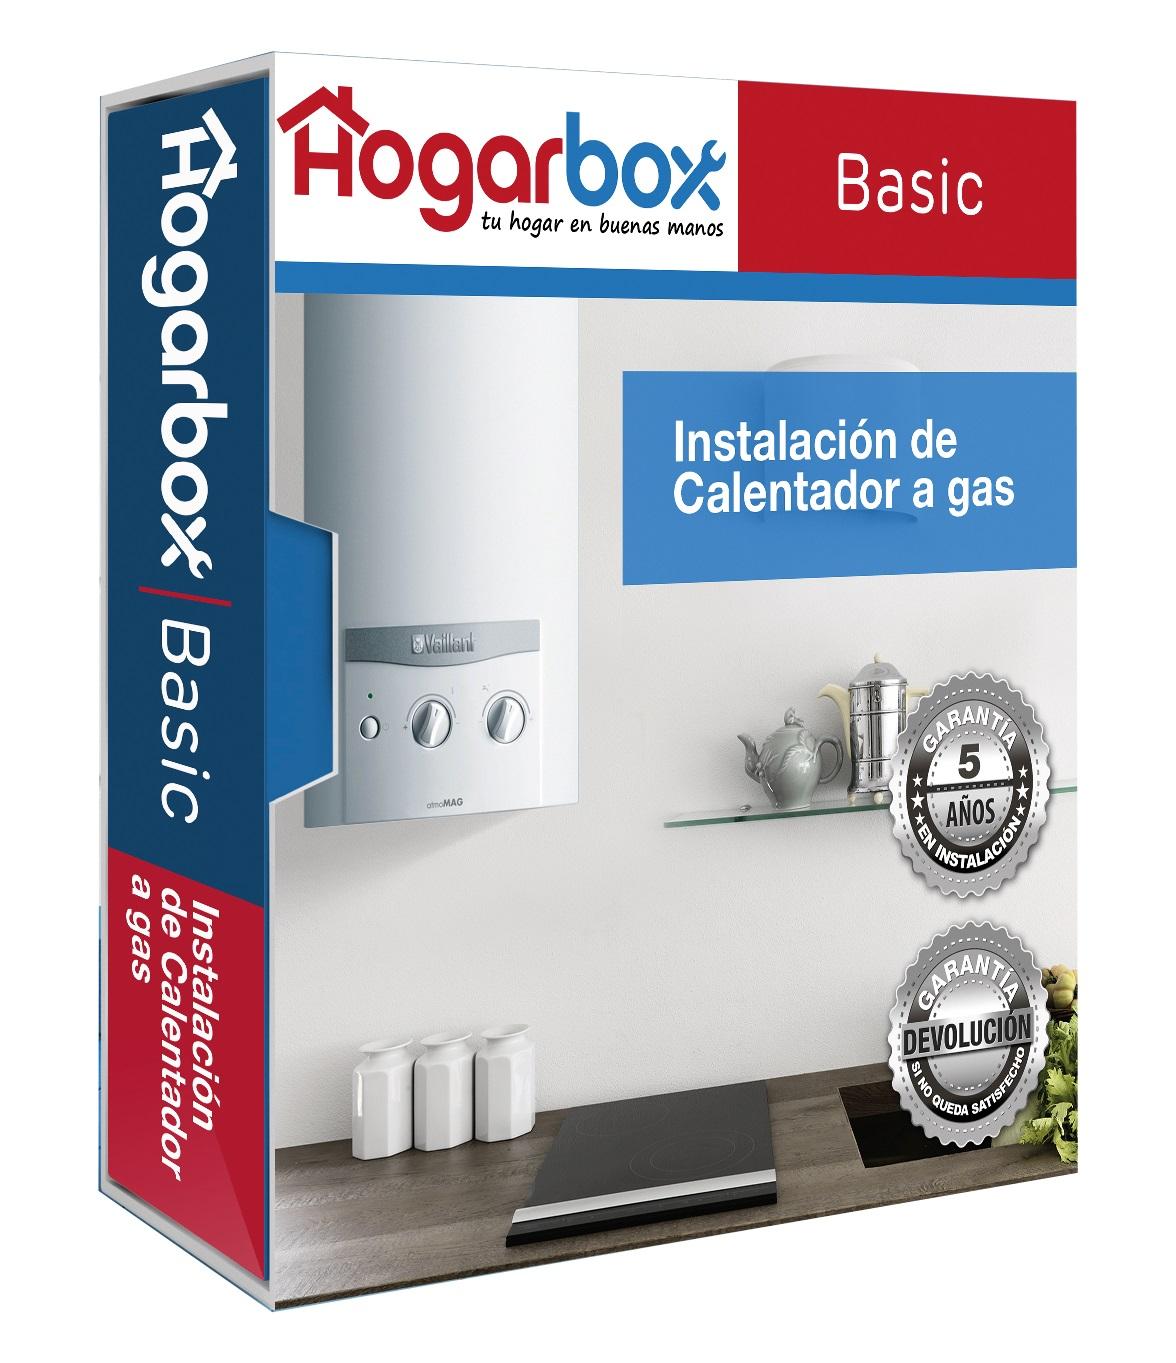 Hogarbox basic precio instalaci n calentador a gas - Calentador a gas ...